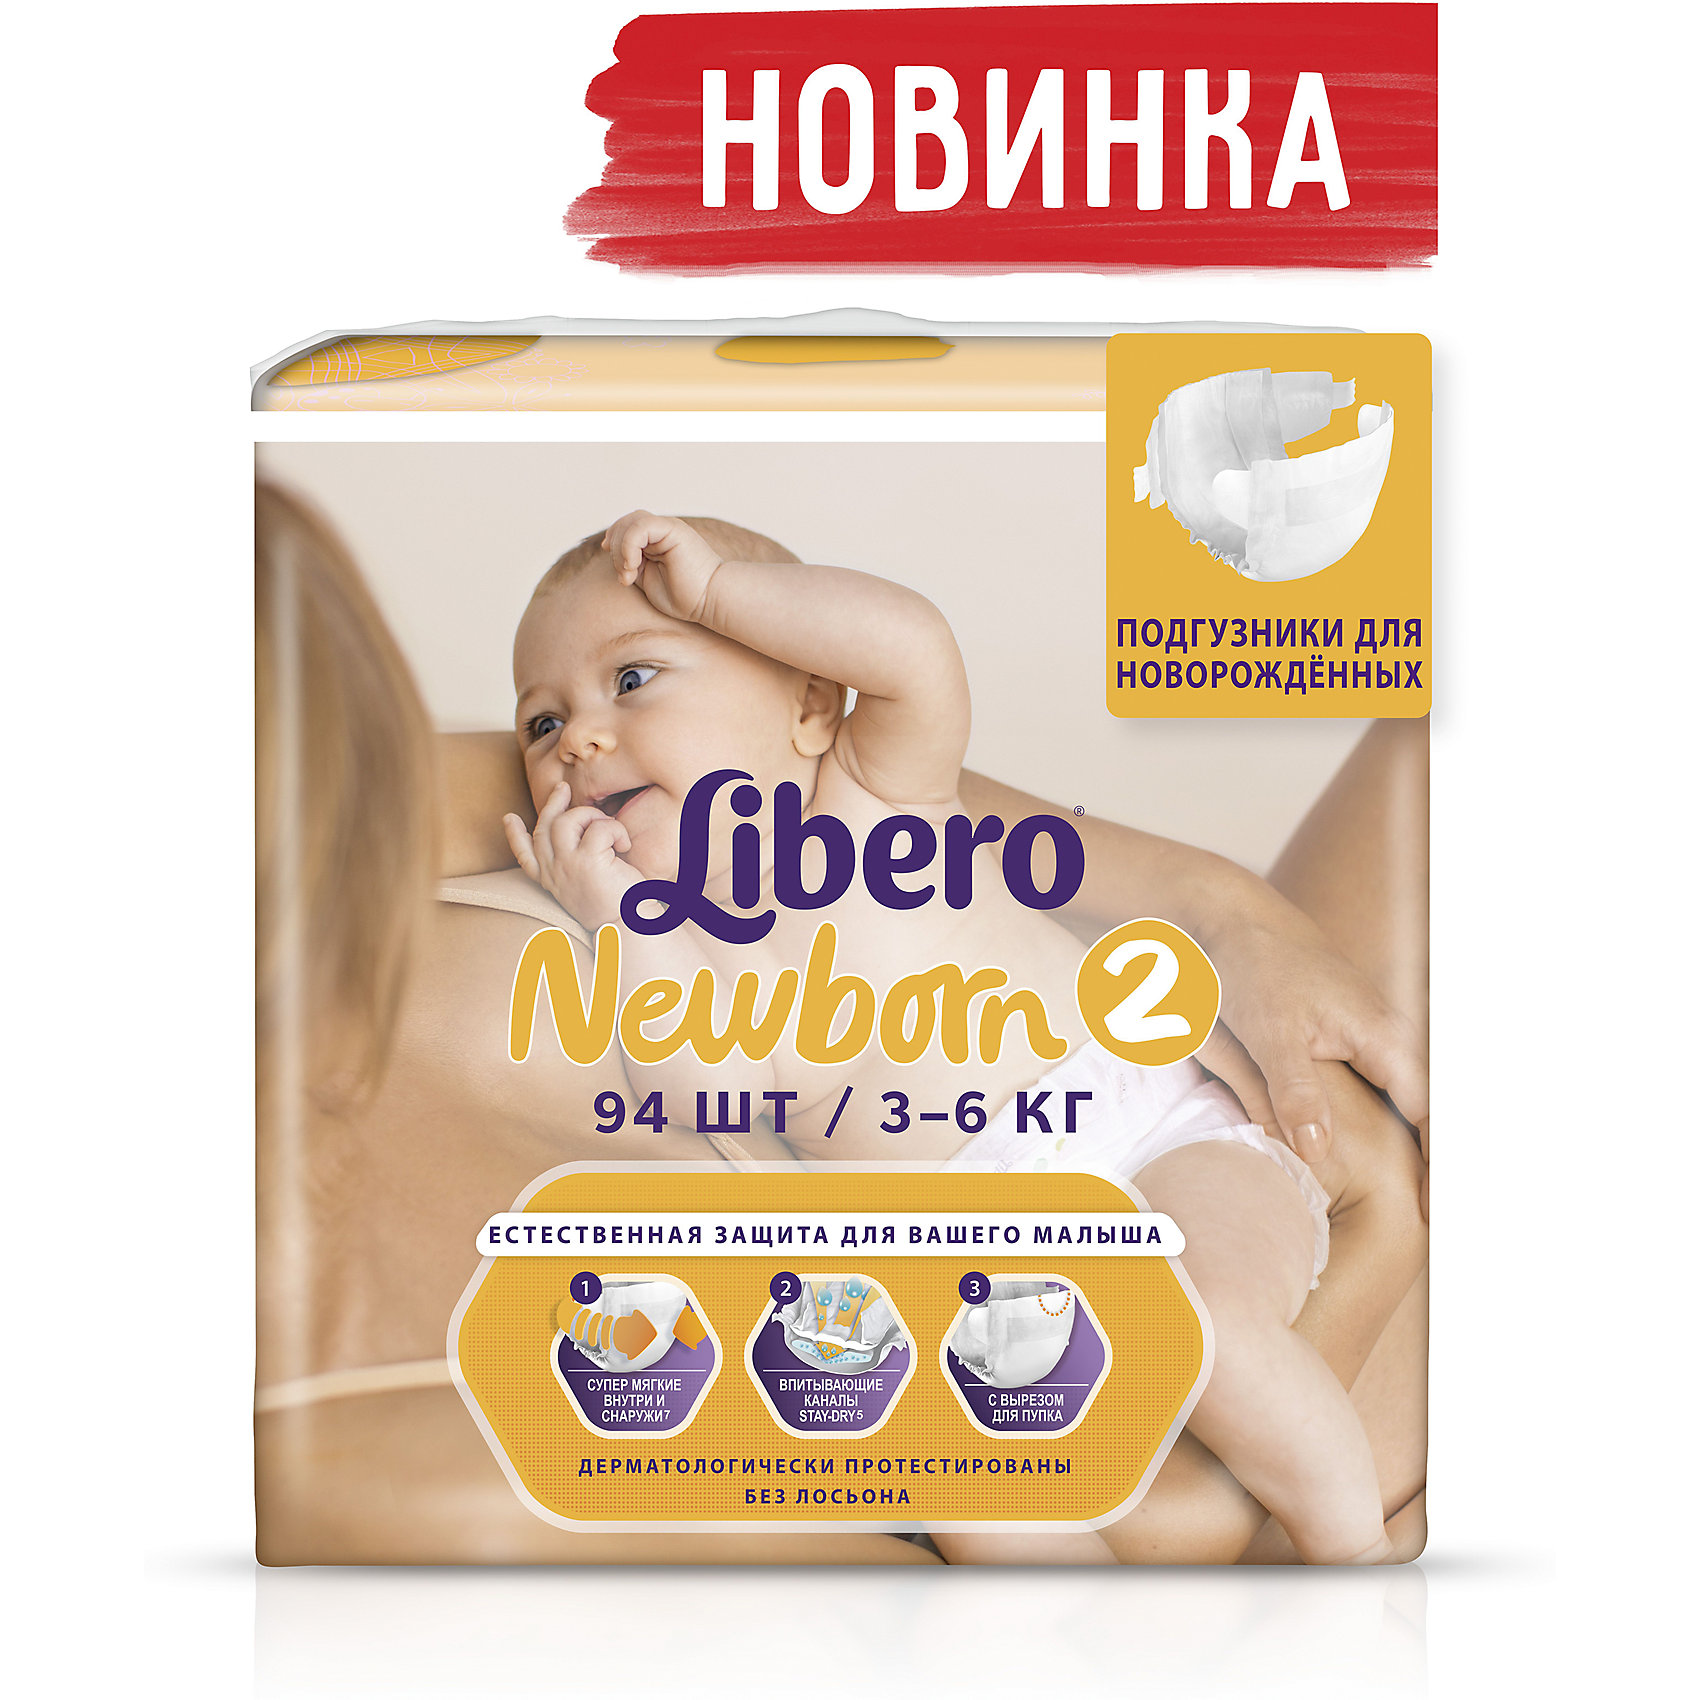 Подгузники Libero Newborn, Mini 3-6 кг (2), 94 шт., Mega Plus от myToys